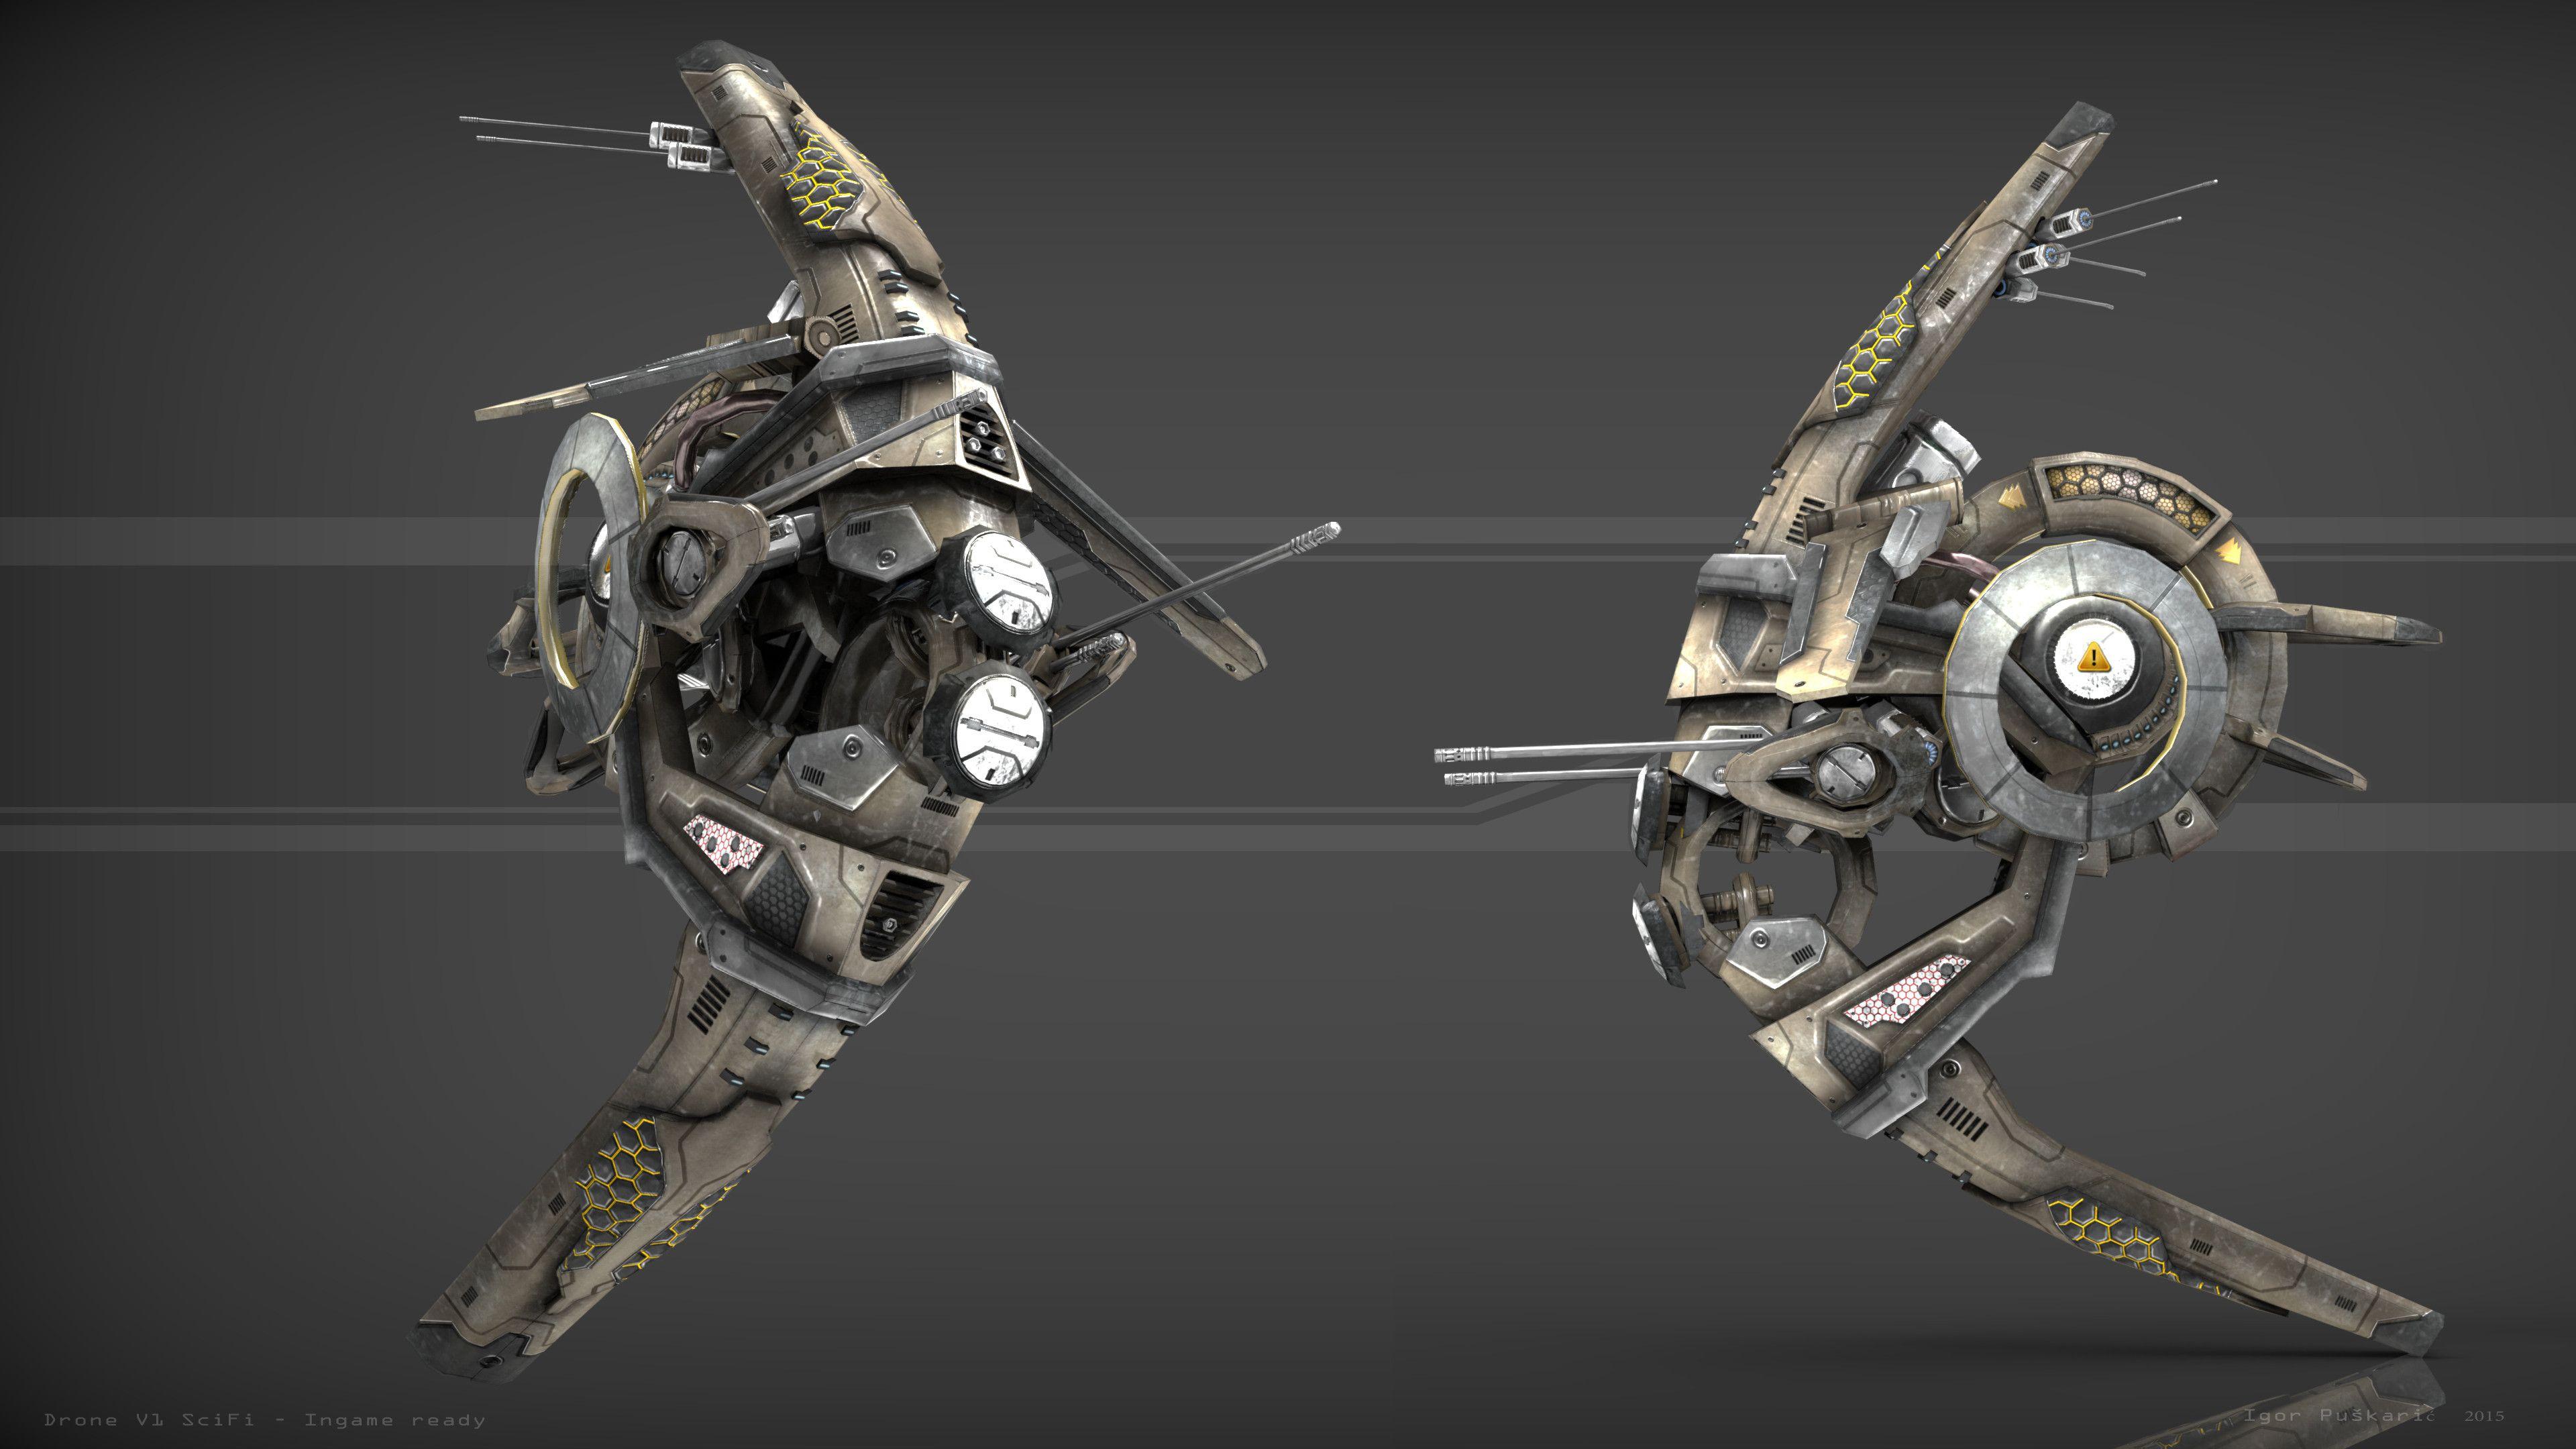 Drone Scifi 3D Model - 3D Model | Spaceships & Space